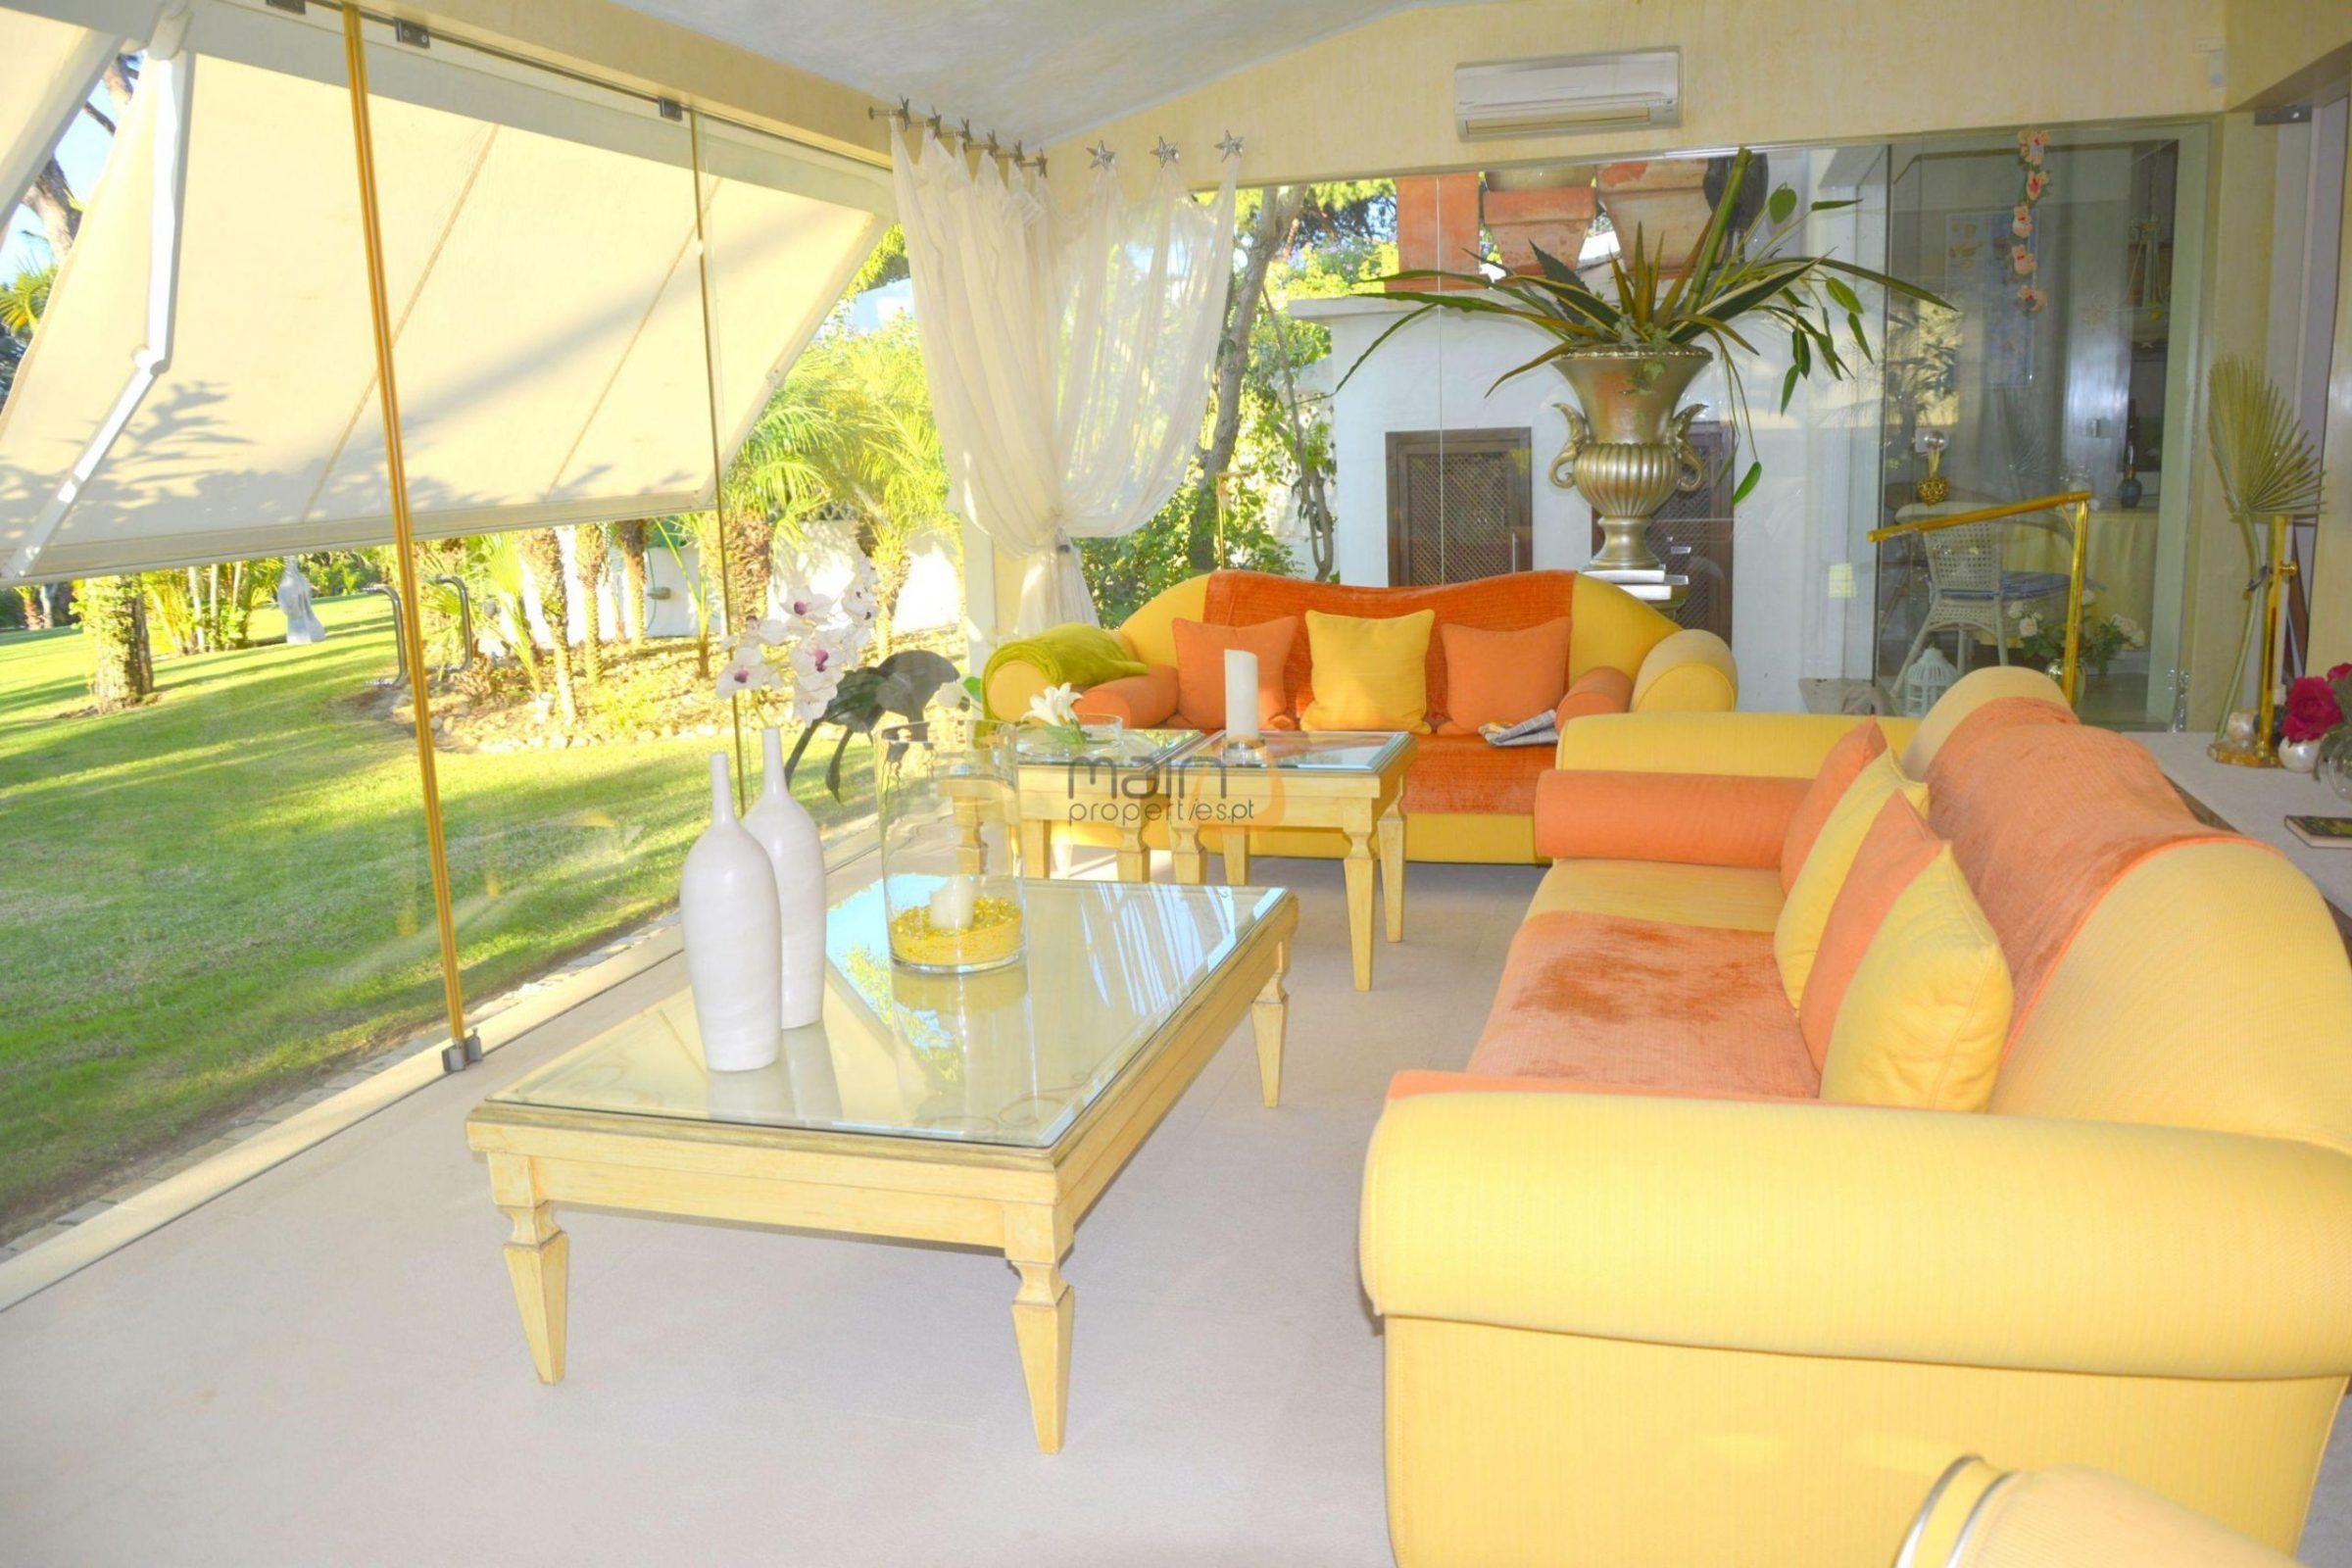 [:pt]Moradia com 5 quartos na Quinta do Lago :: Sala 3 :: MainProperties :: 020061[:en]5 bedroom villa in Quinta do Lago :: Living Room 2 :: MainProperties :: 020061[:]